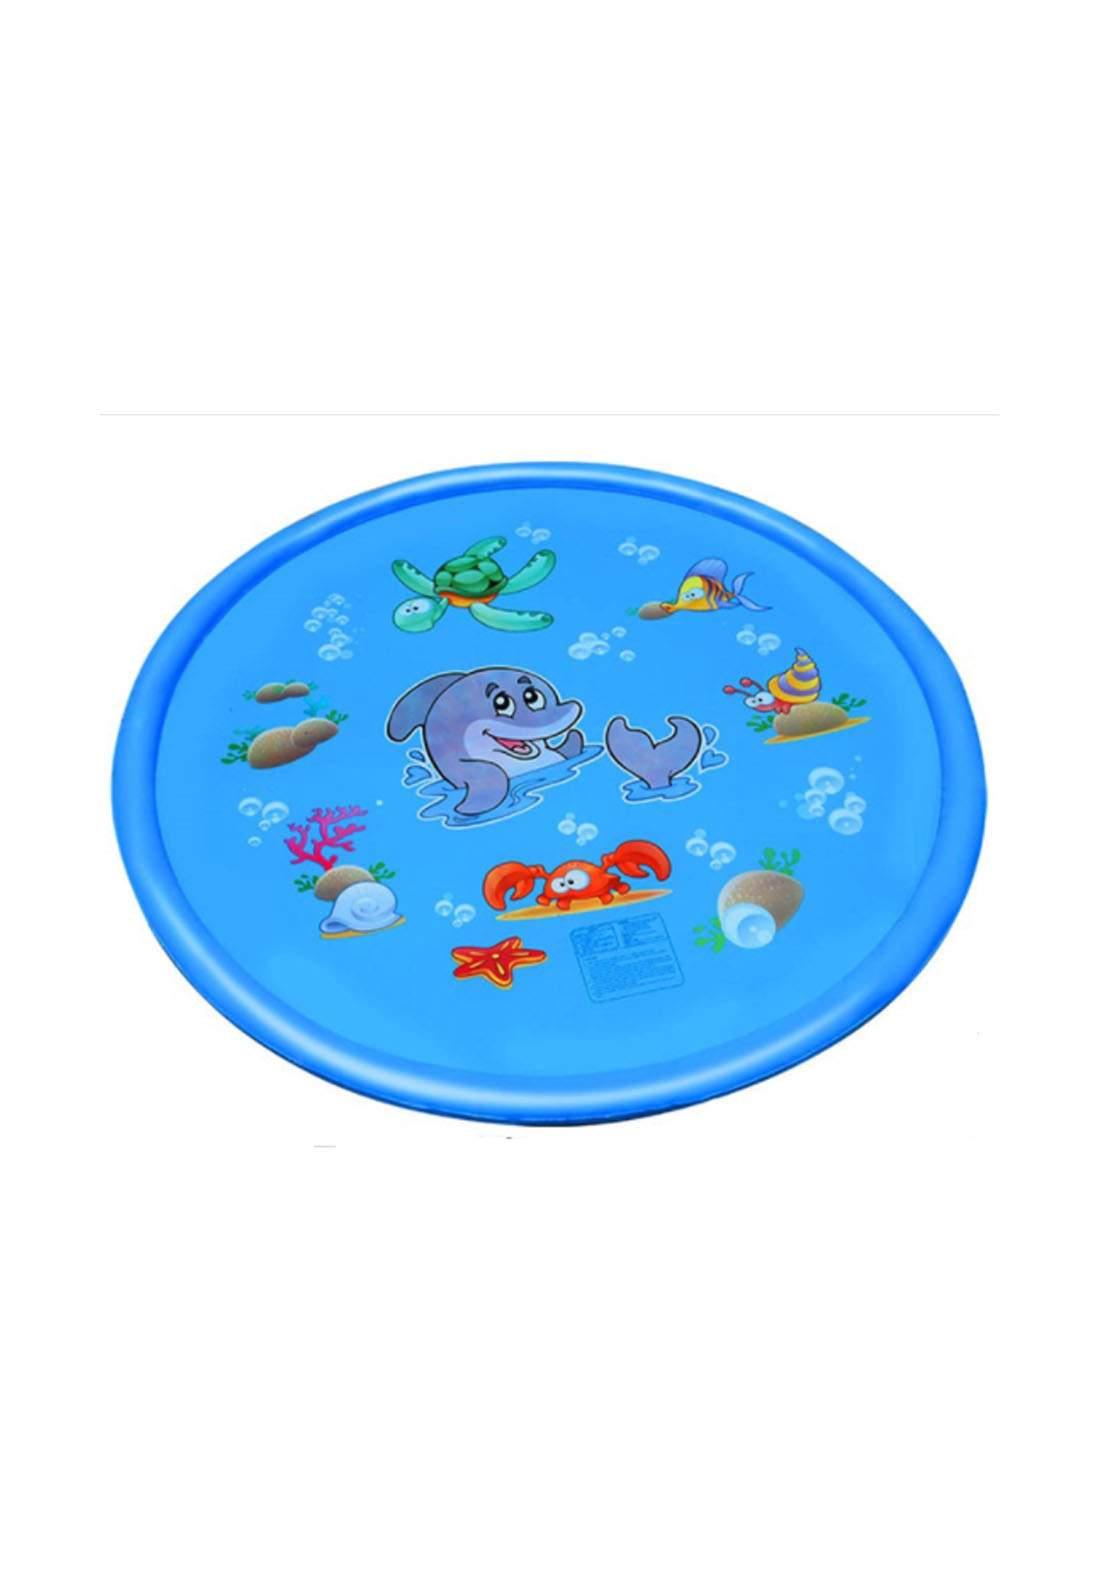 Splash Pad and Wading Pool for Learning Kids Sprinkler Pool  نافورة اطفال ارضية